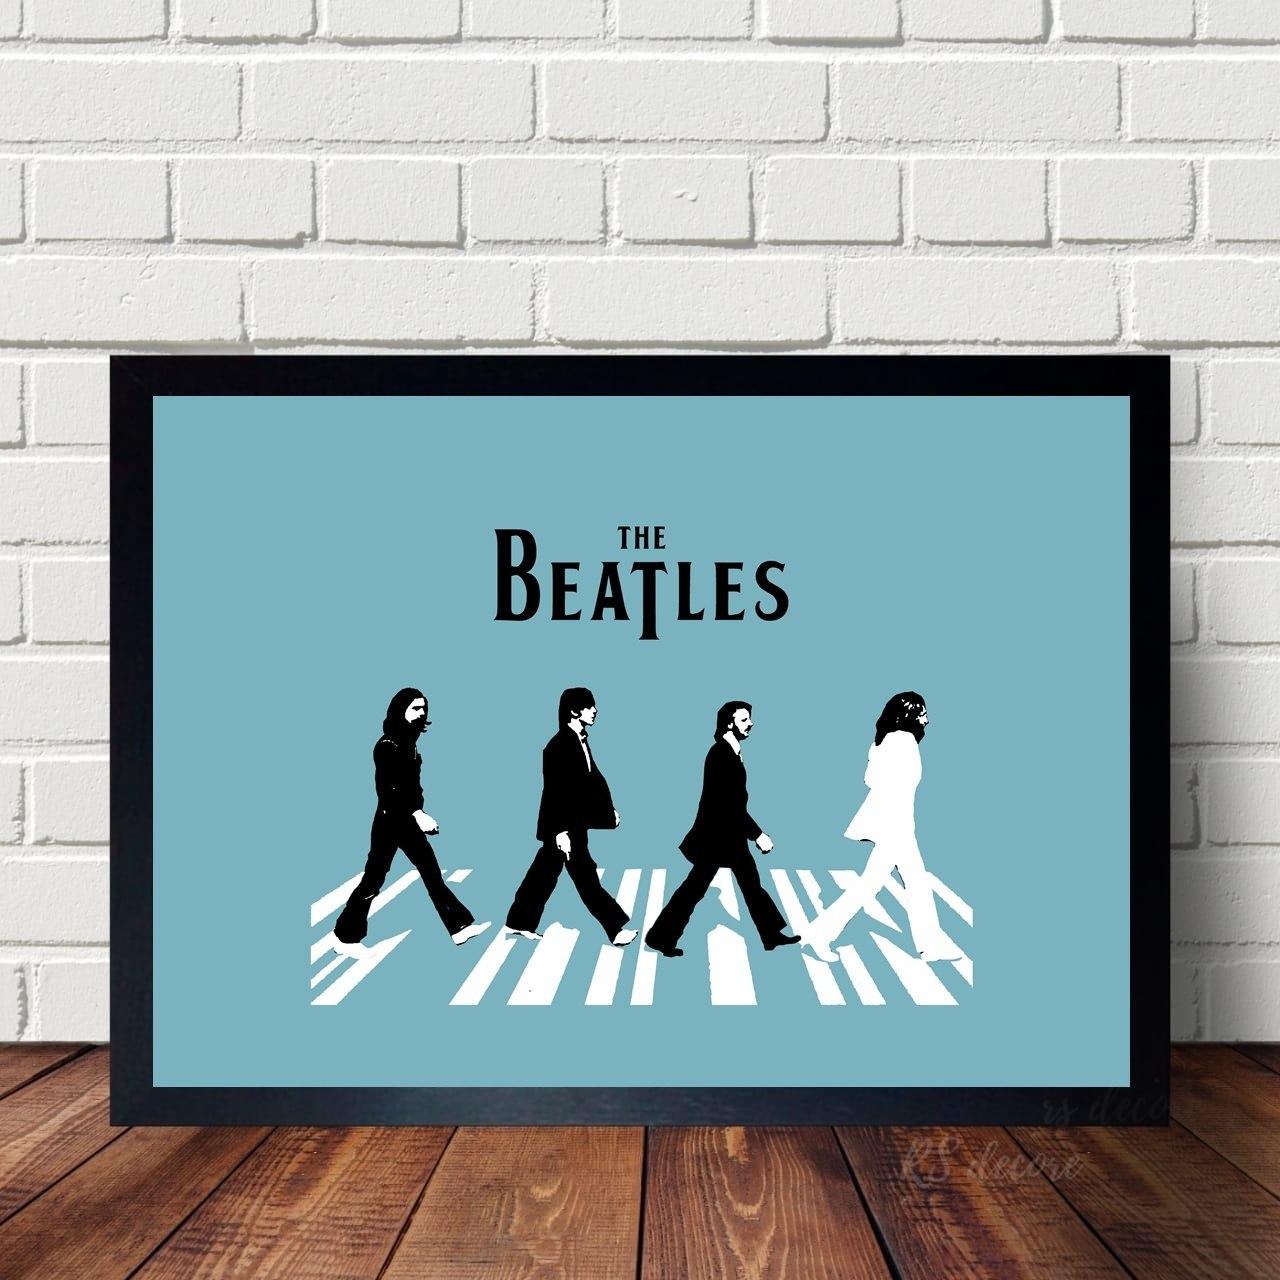 Quadro Decorativo Minimalista The Beatles